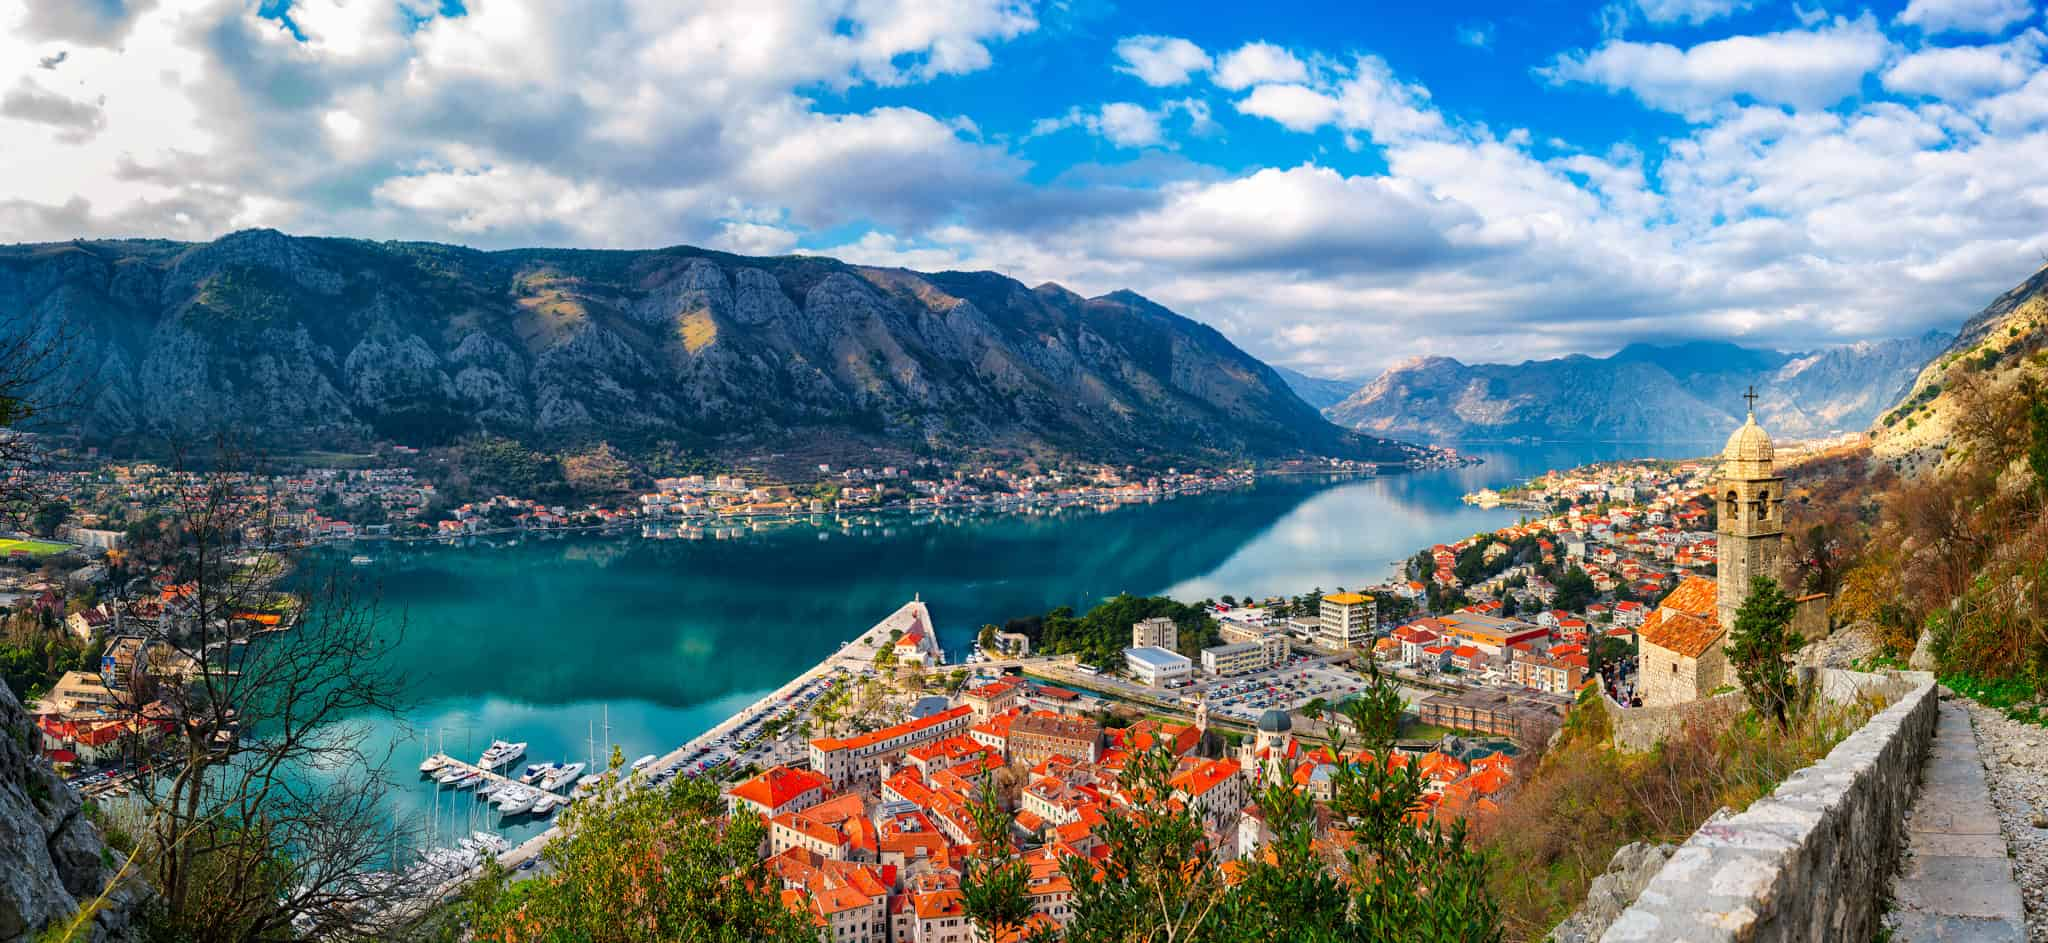 Panaromic view of the Bay of Kotor